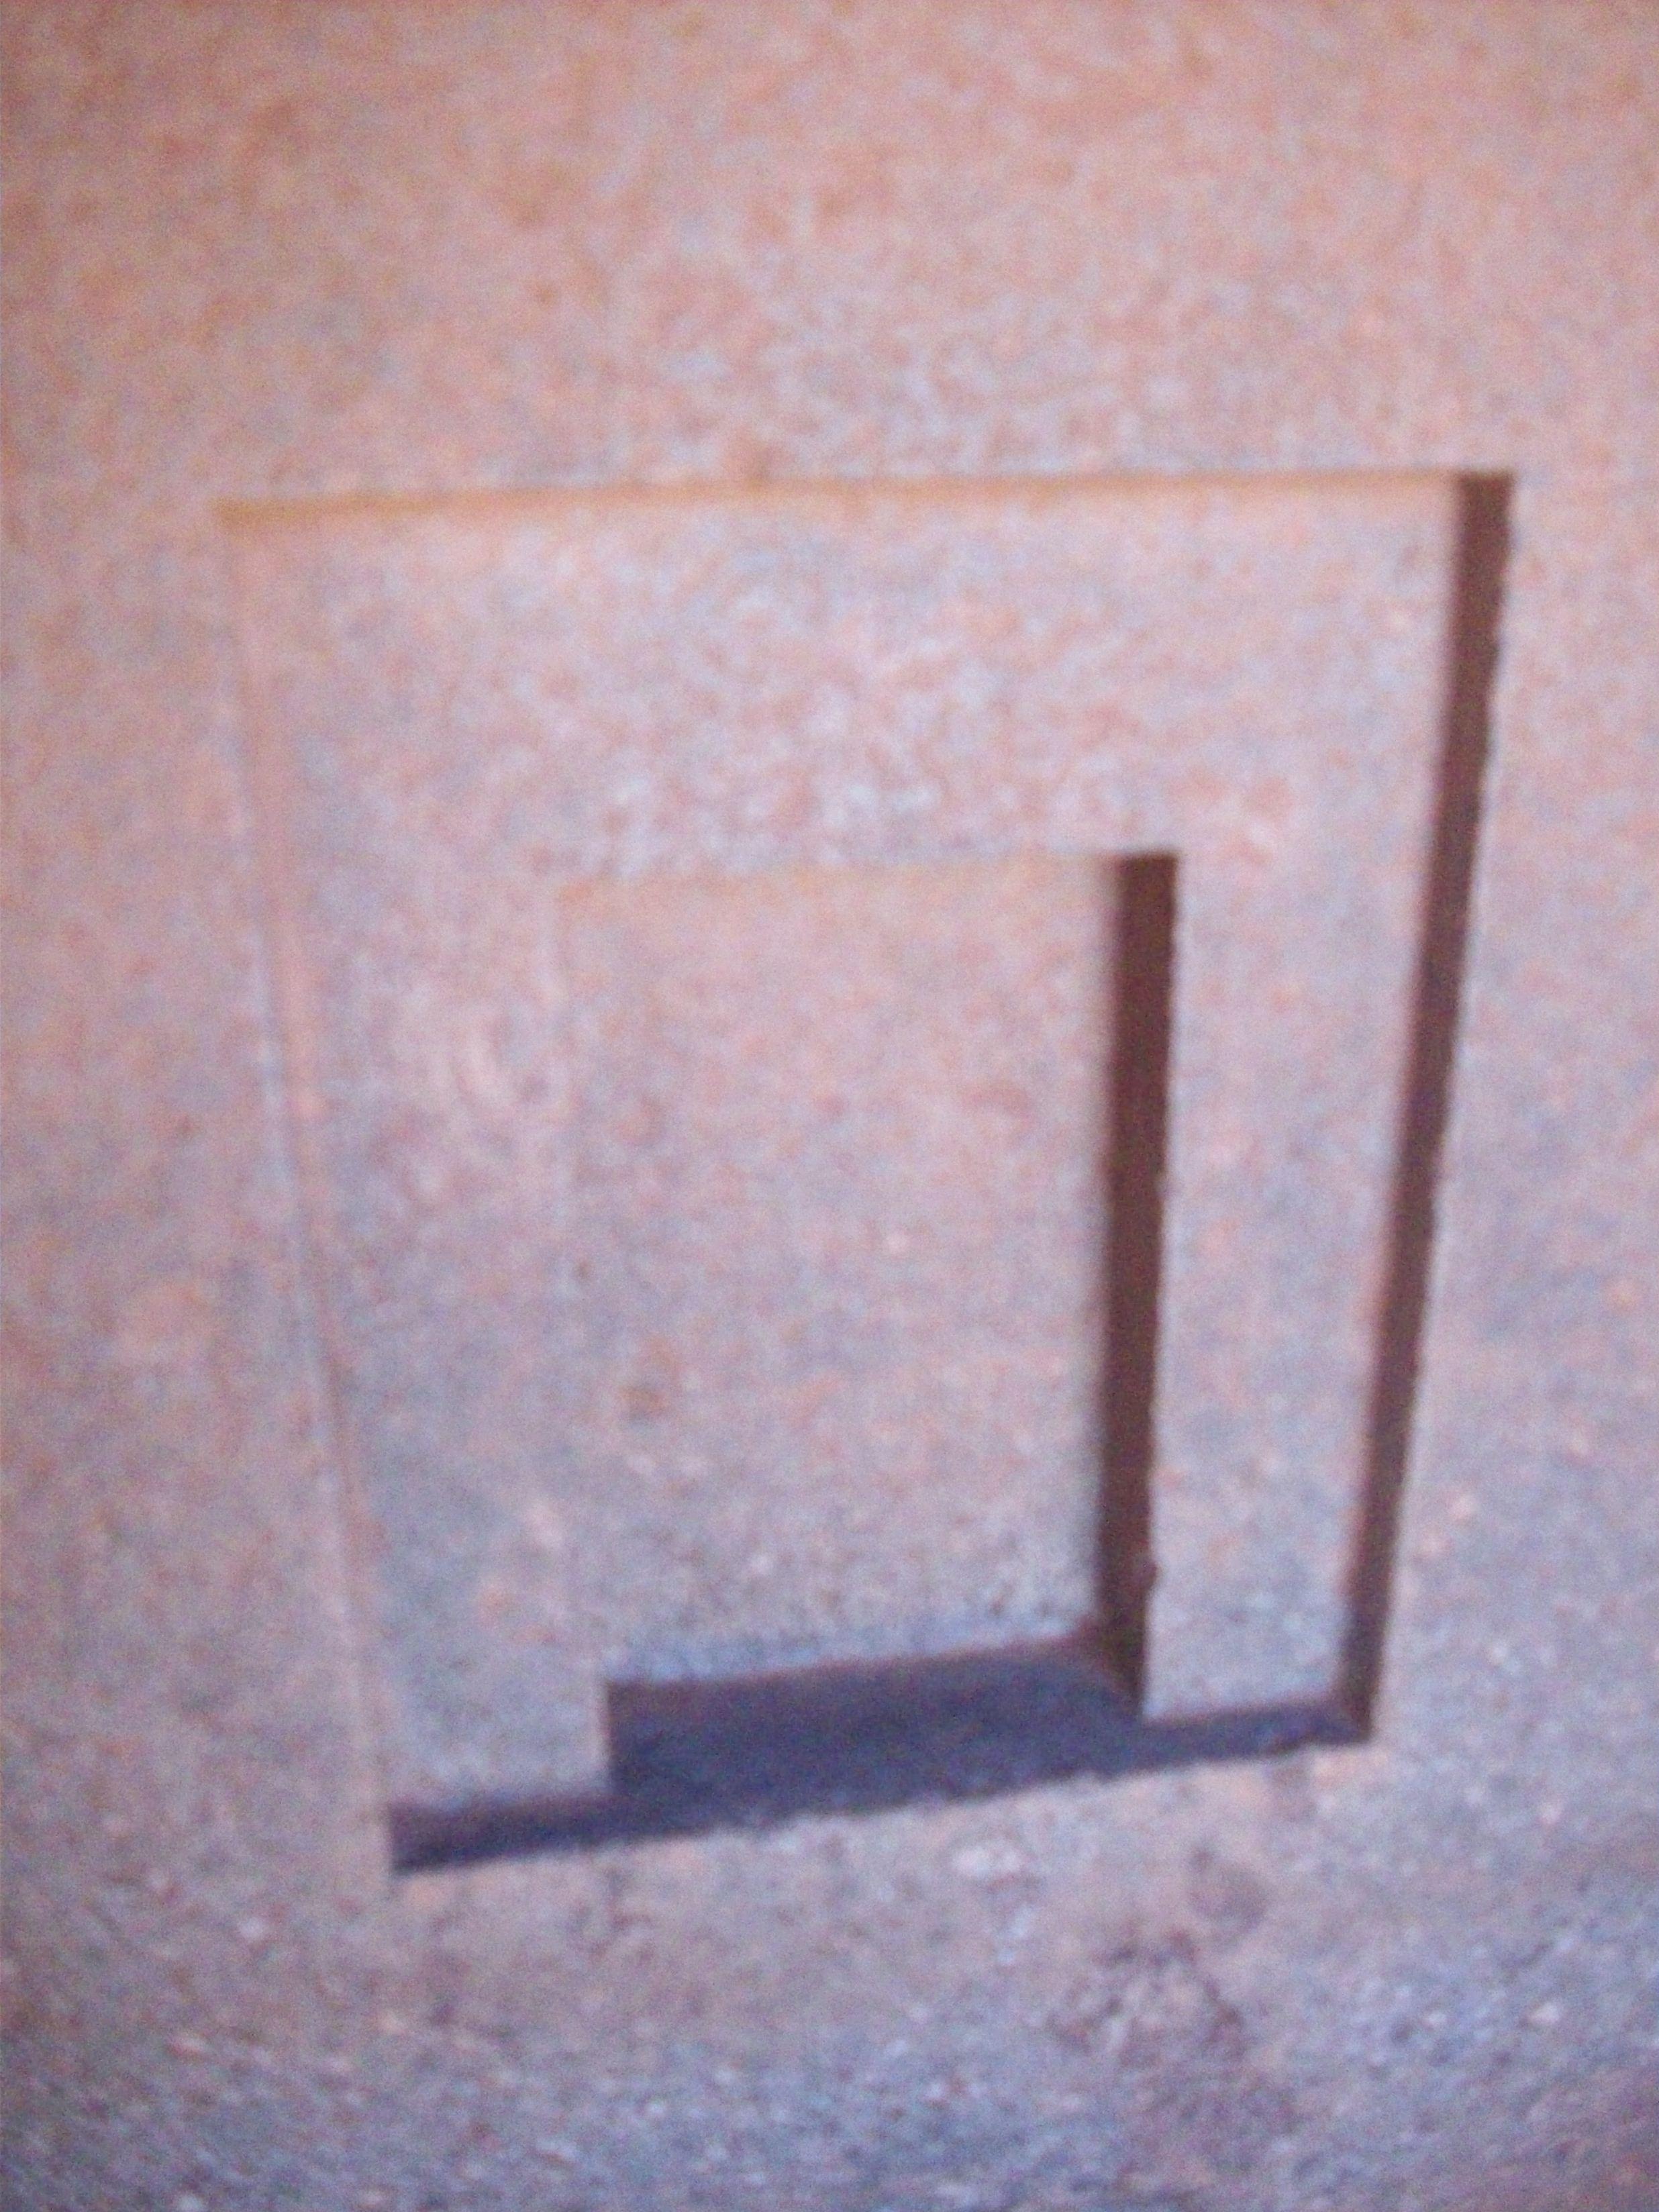 Perfectly Machined Stone Ancient Site of Pumapunku